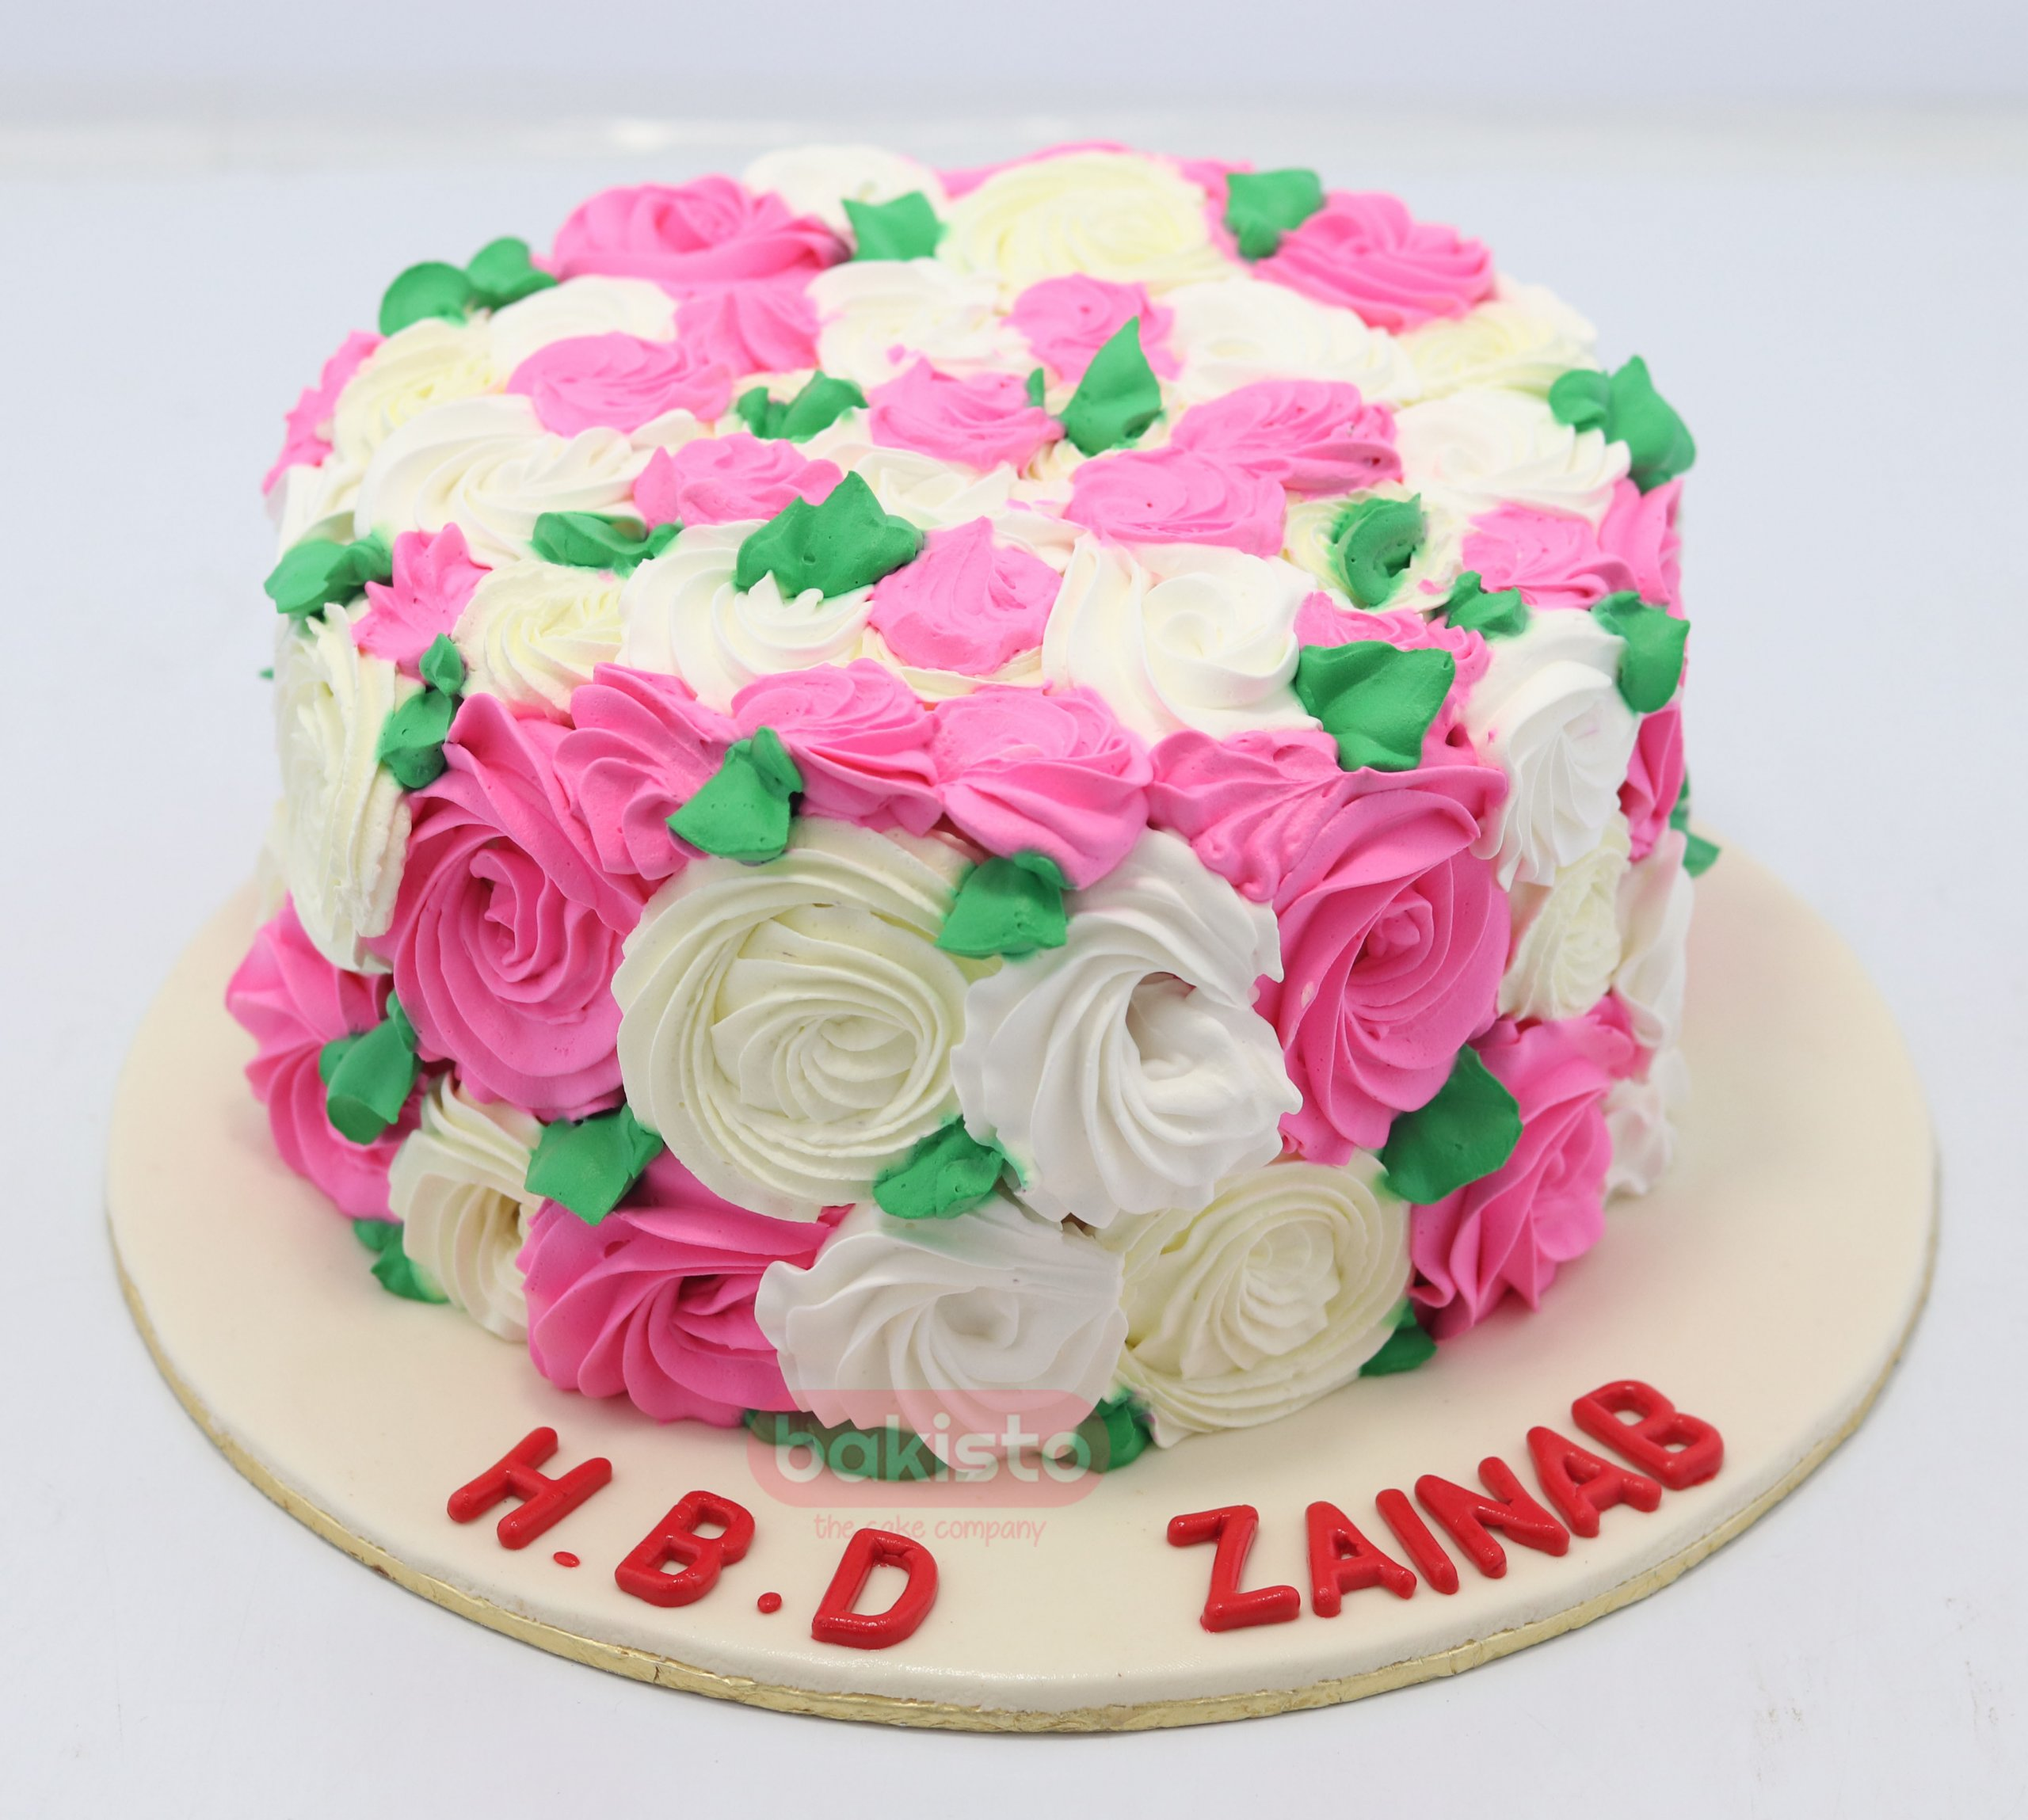 Magnificent Girl Theme Birthday Cake By Bakisto The Cake Company Birthday Cards Printable Opercafe Filternl